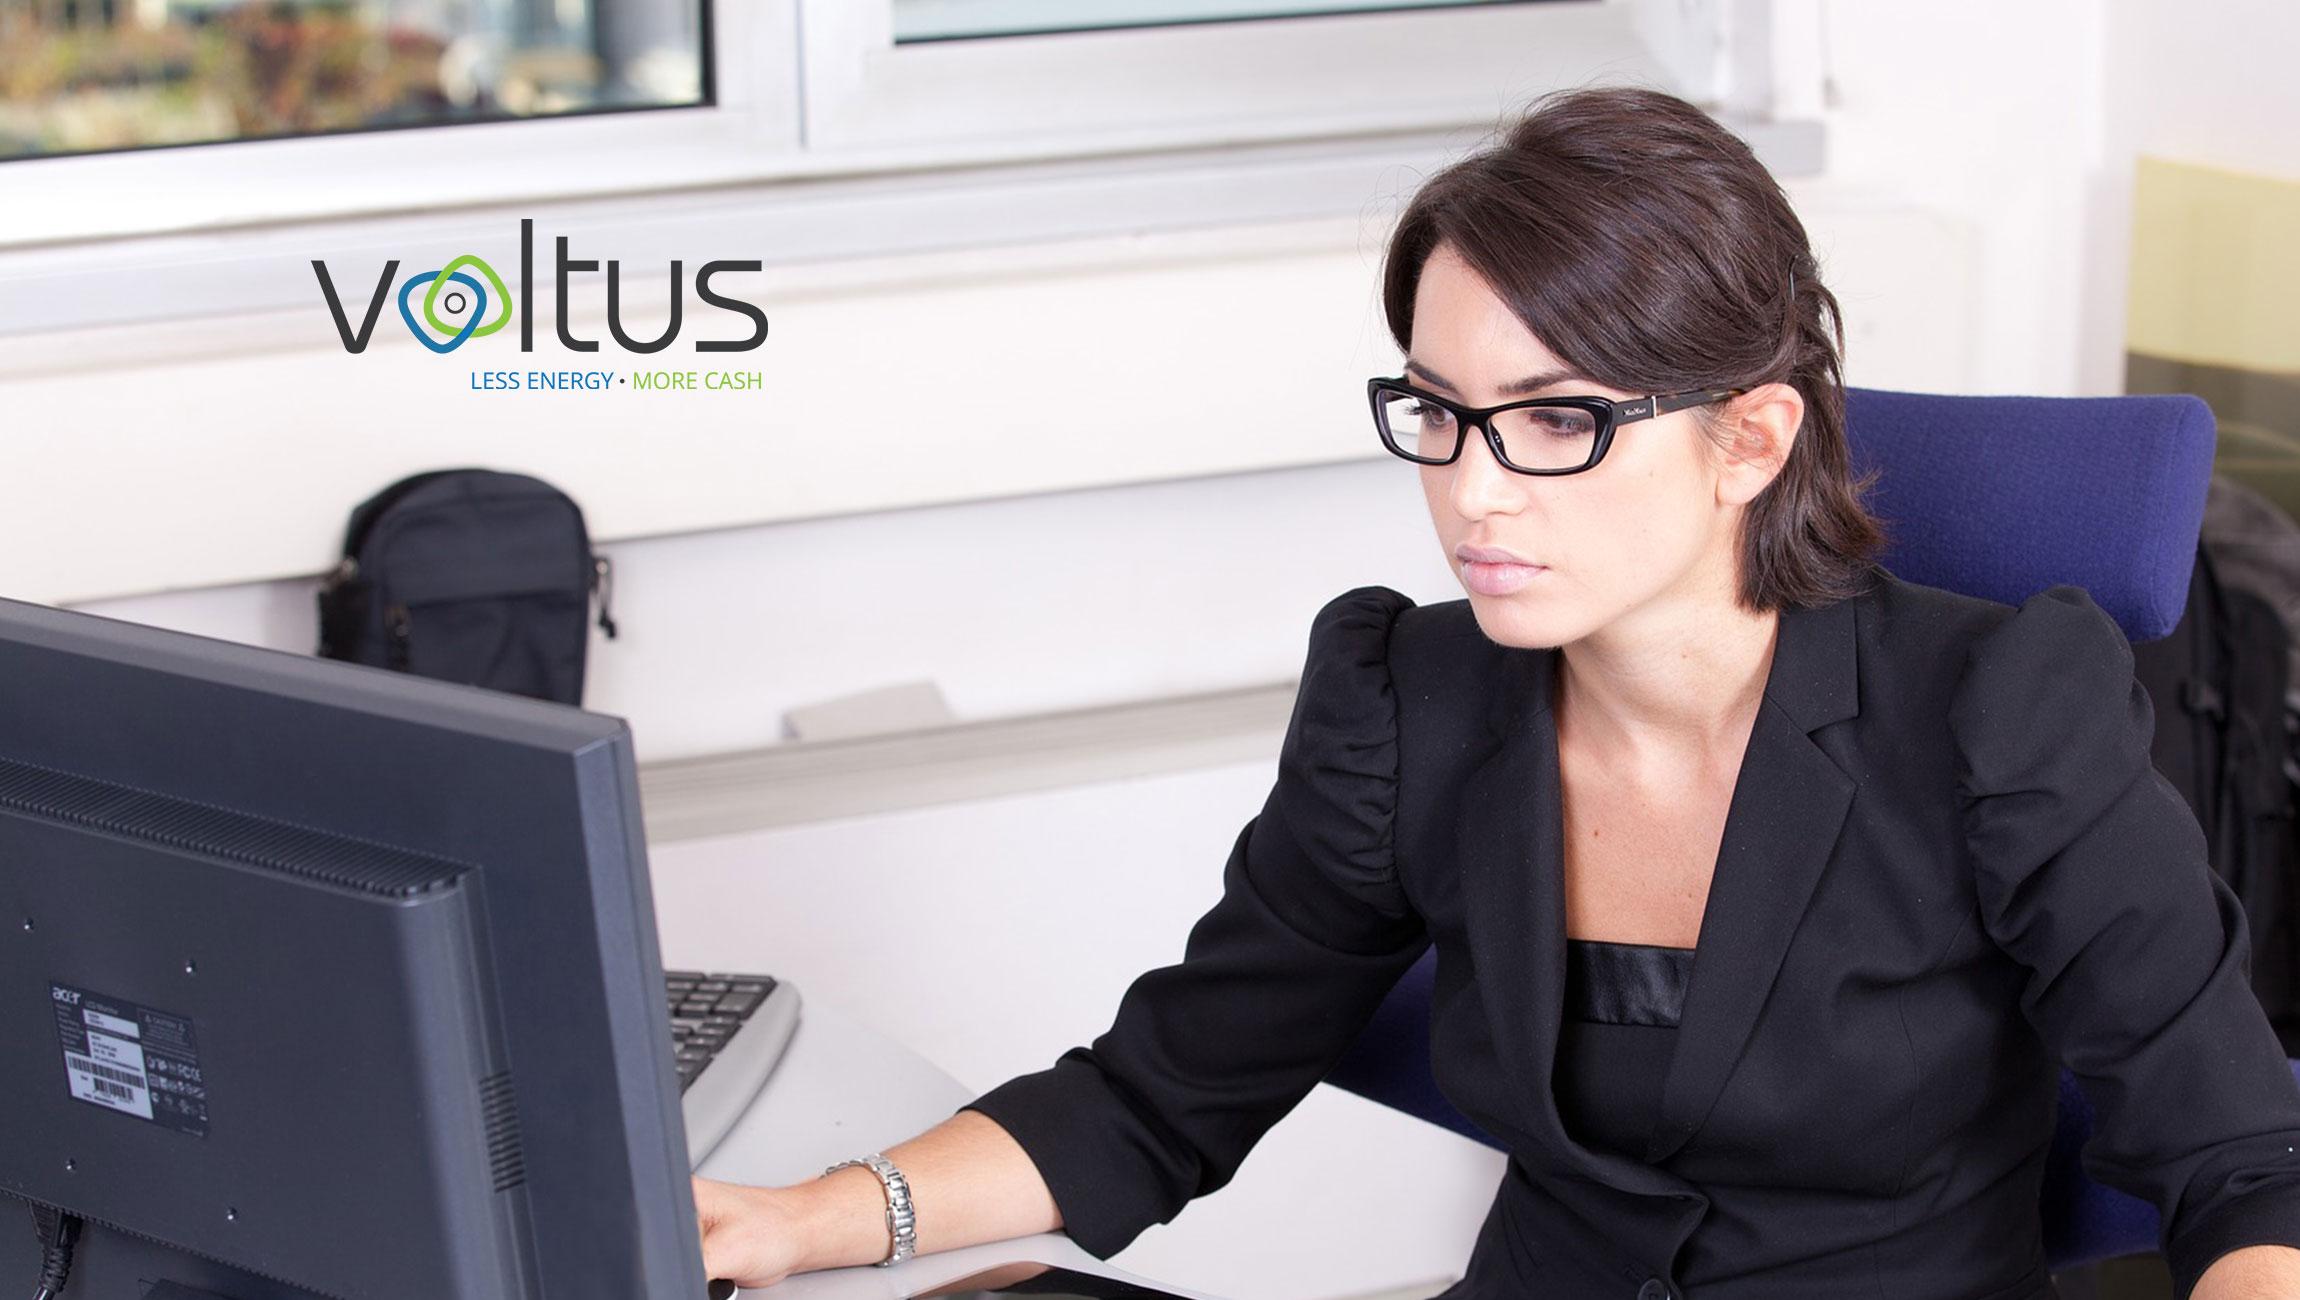 Voltus CashDash Launched As World's Largest Database of Demand Response Programs